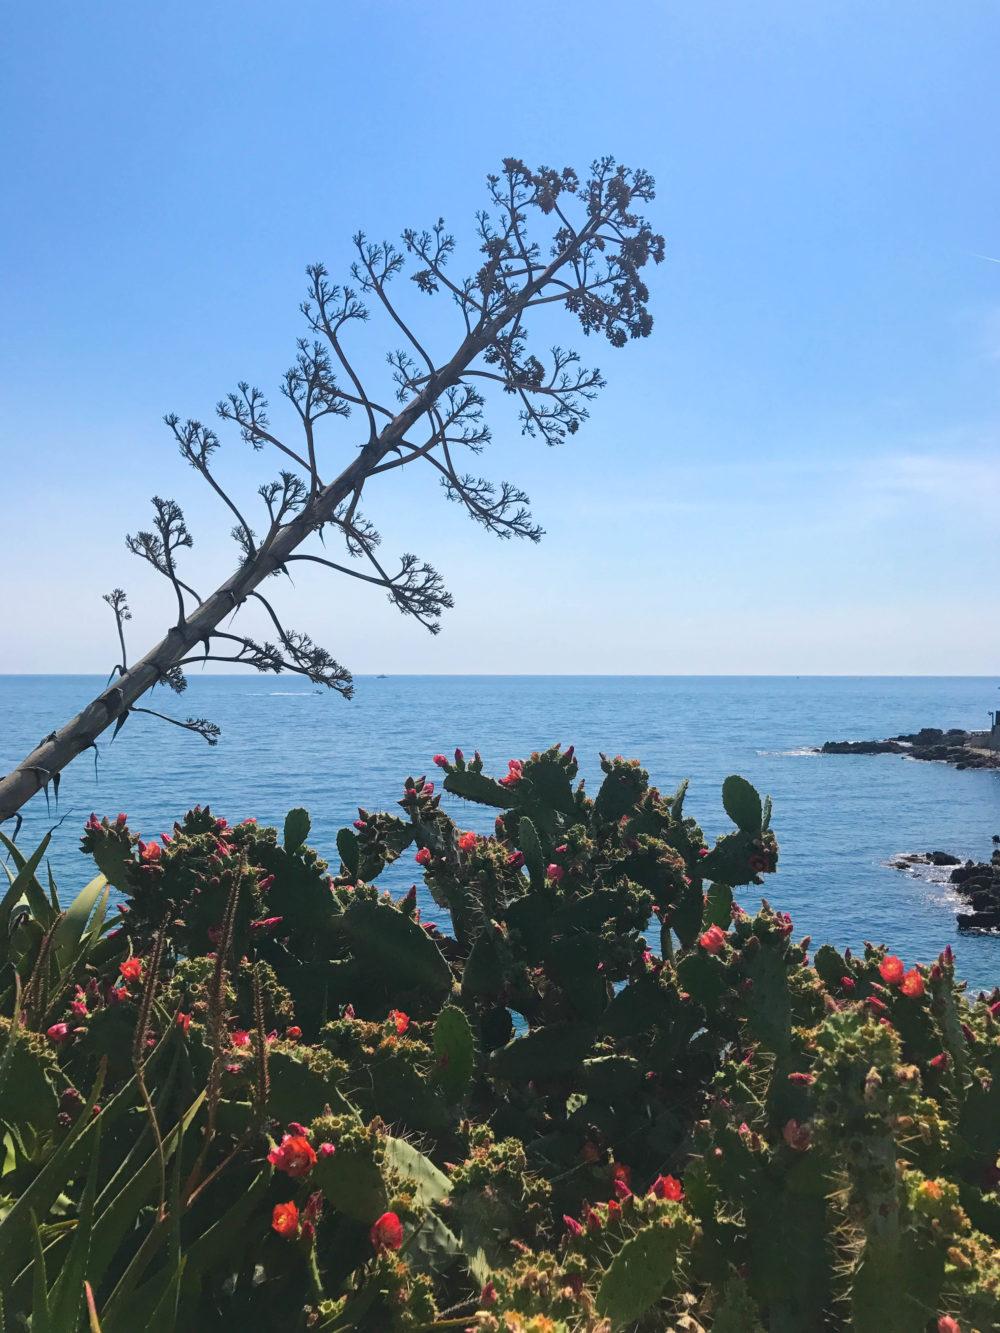 garoupe-cap-dantibes-sentier-du-littoral-e1497946695713